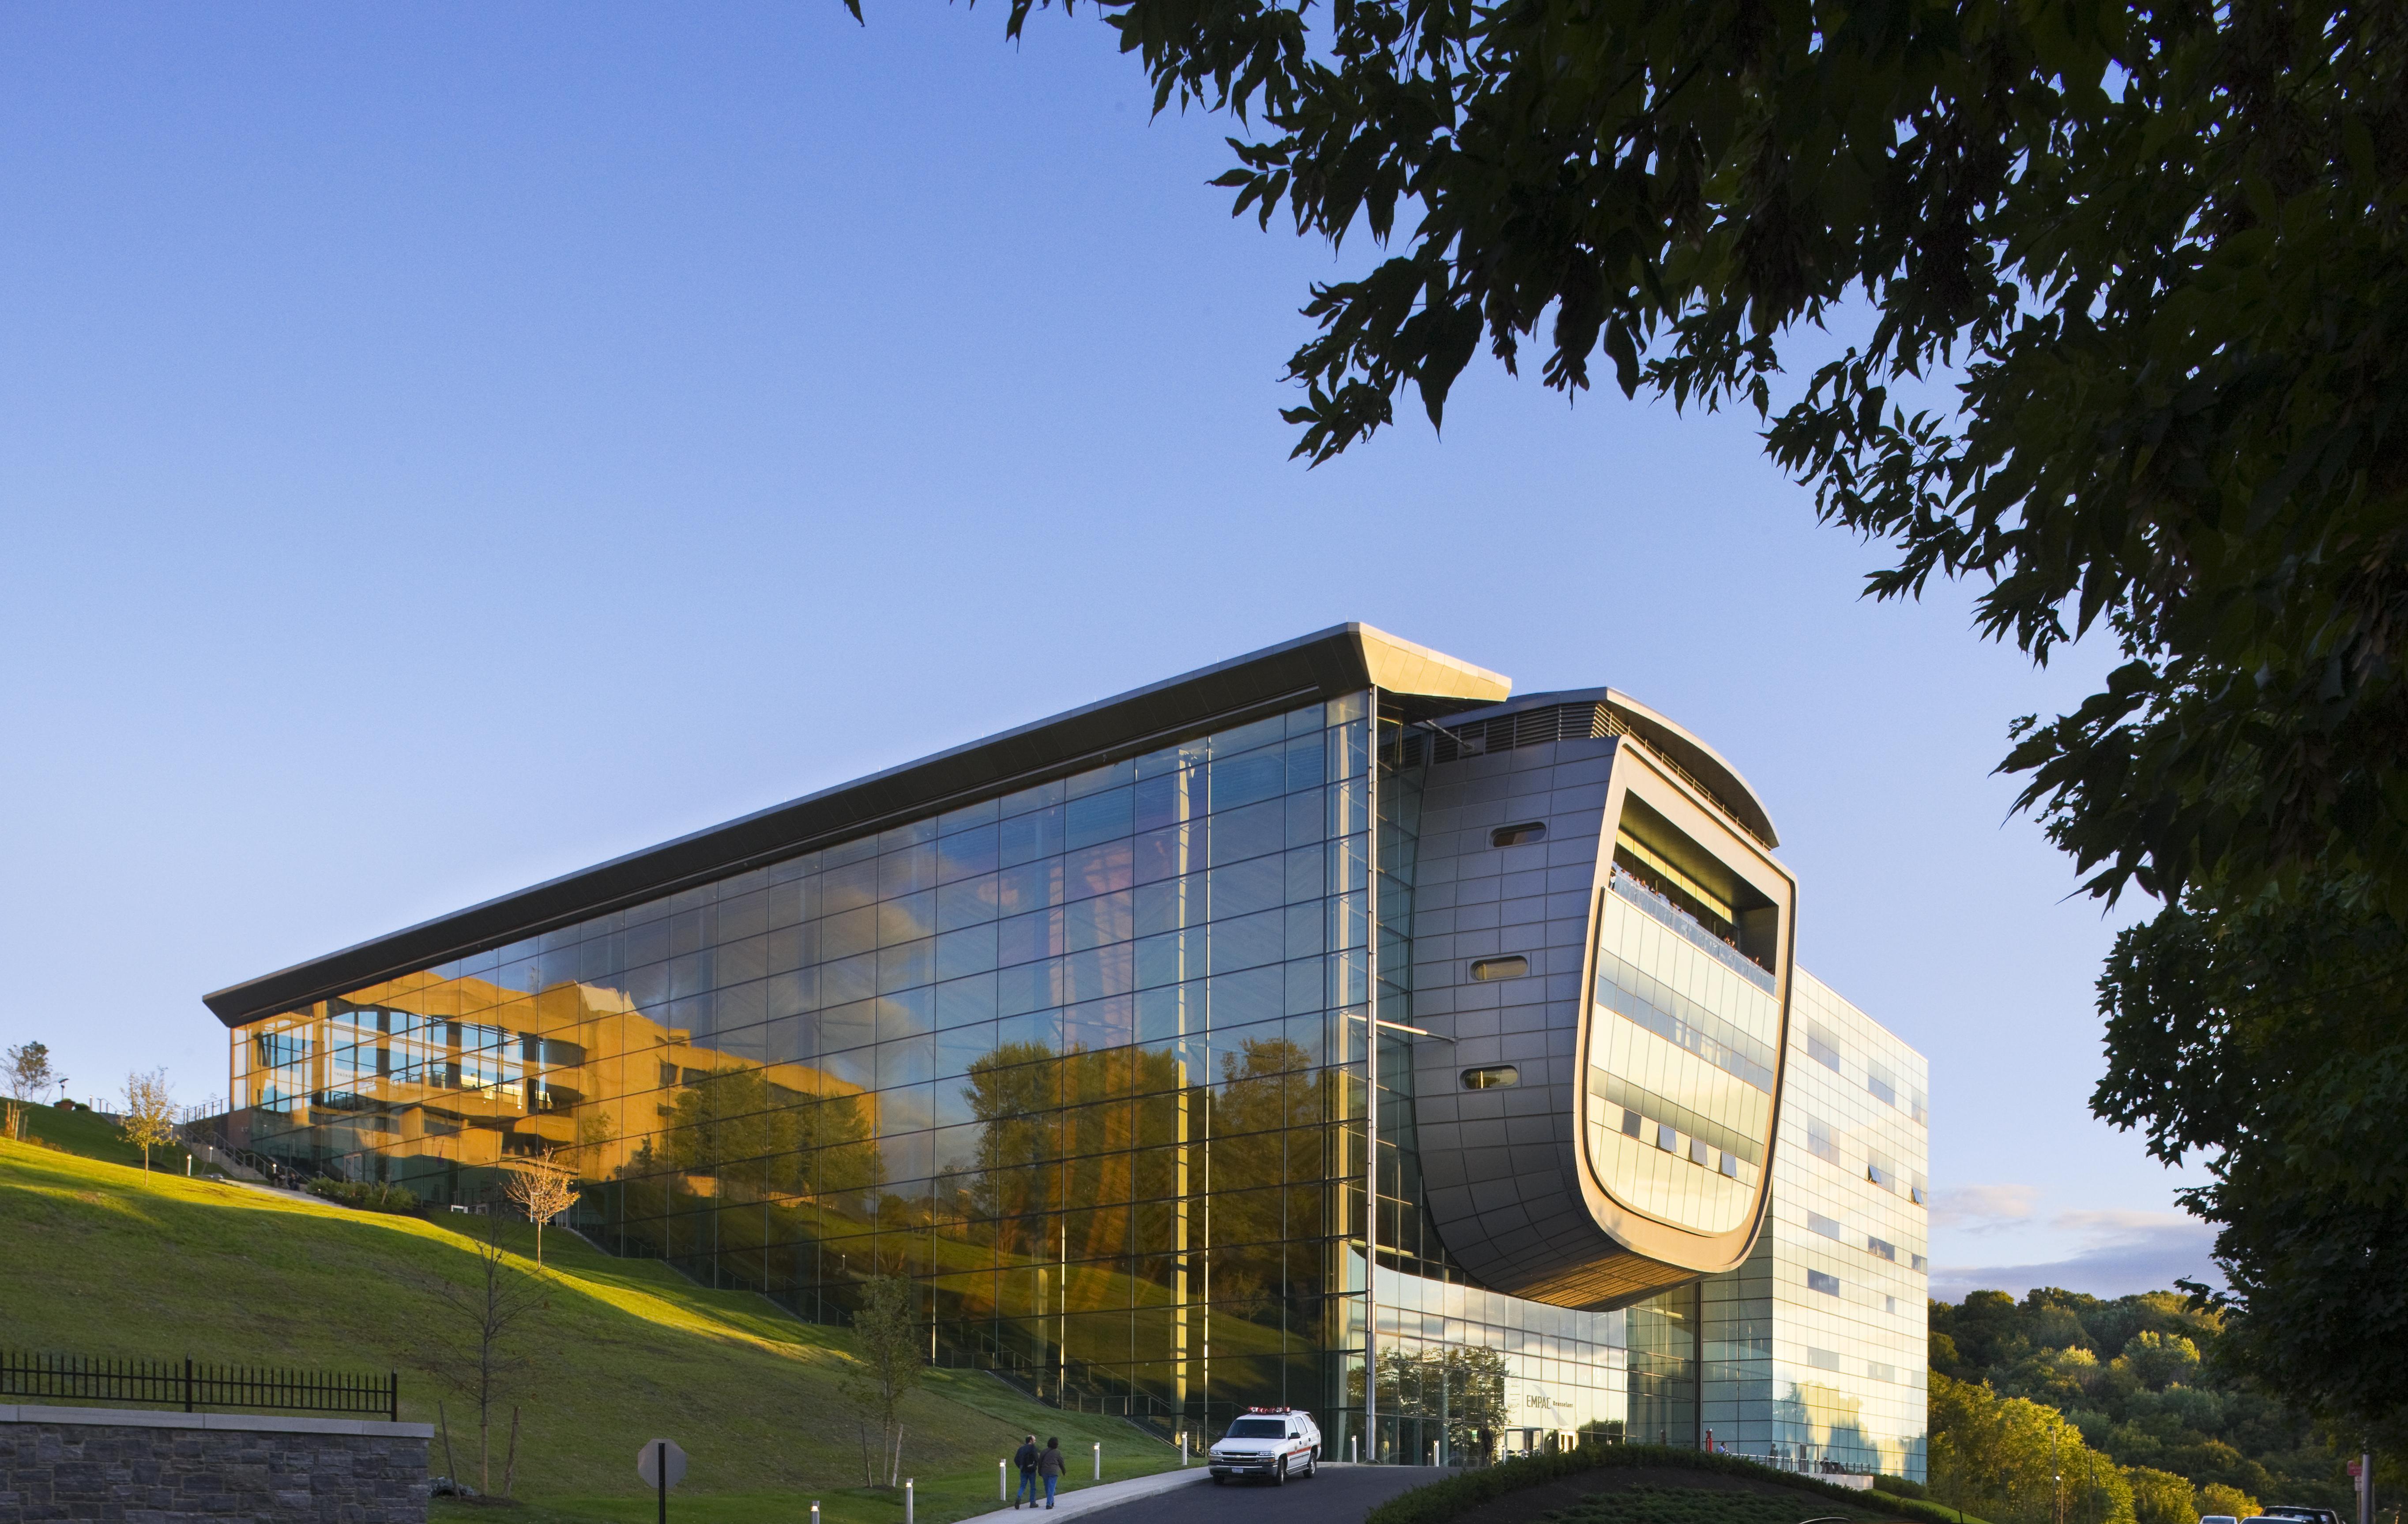 North York Performing Arts Centre